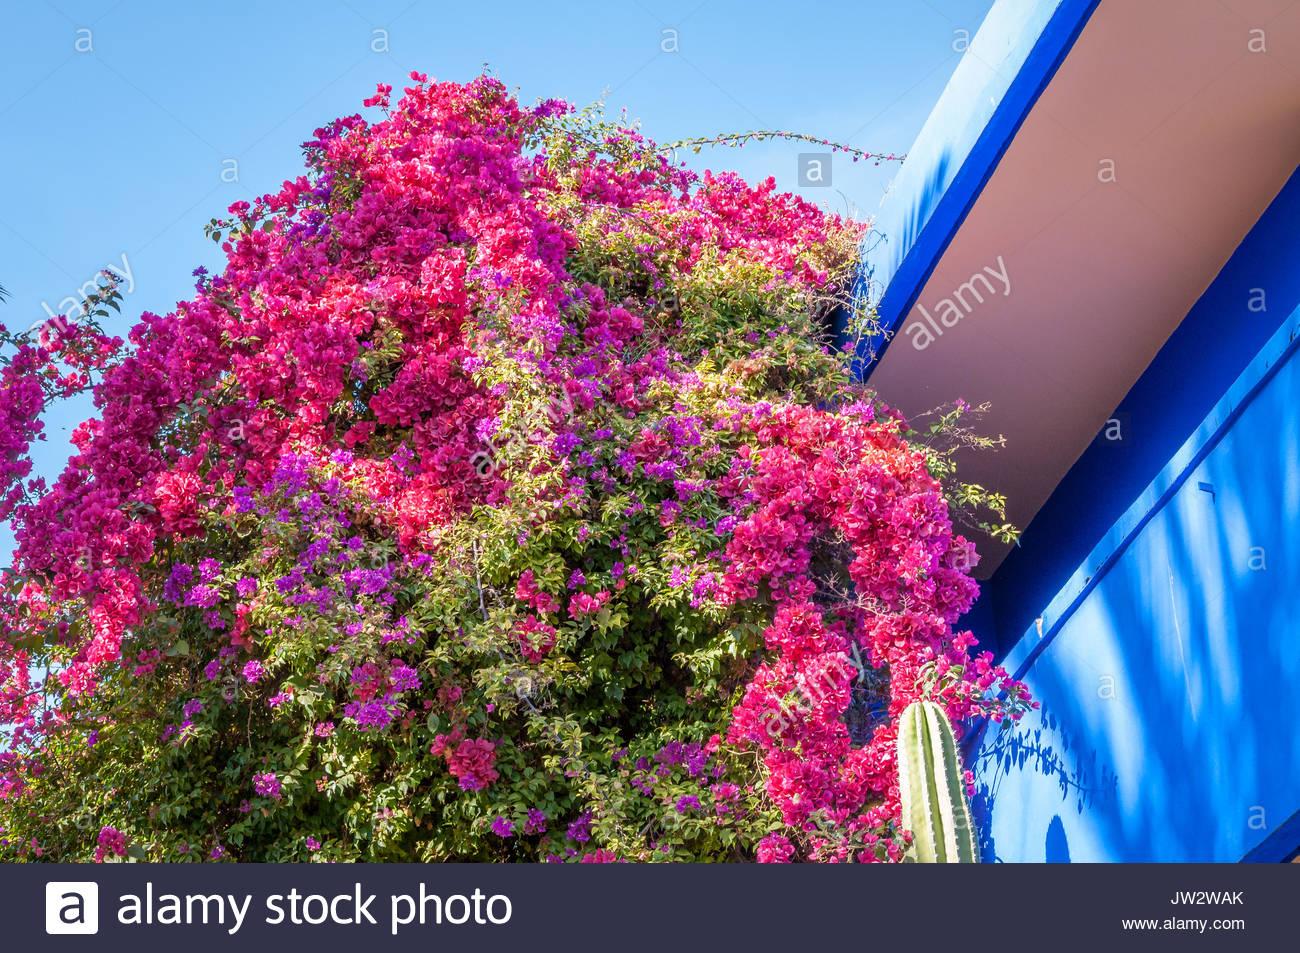 Pink flora in bloom at Jardin Majorelle, Marrakech. - Stock Image